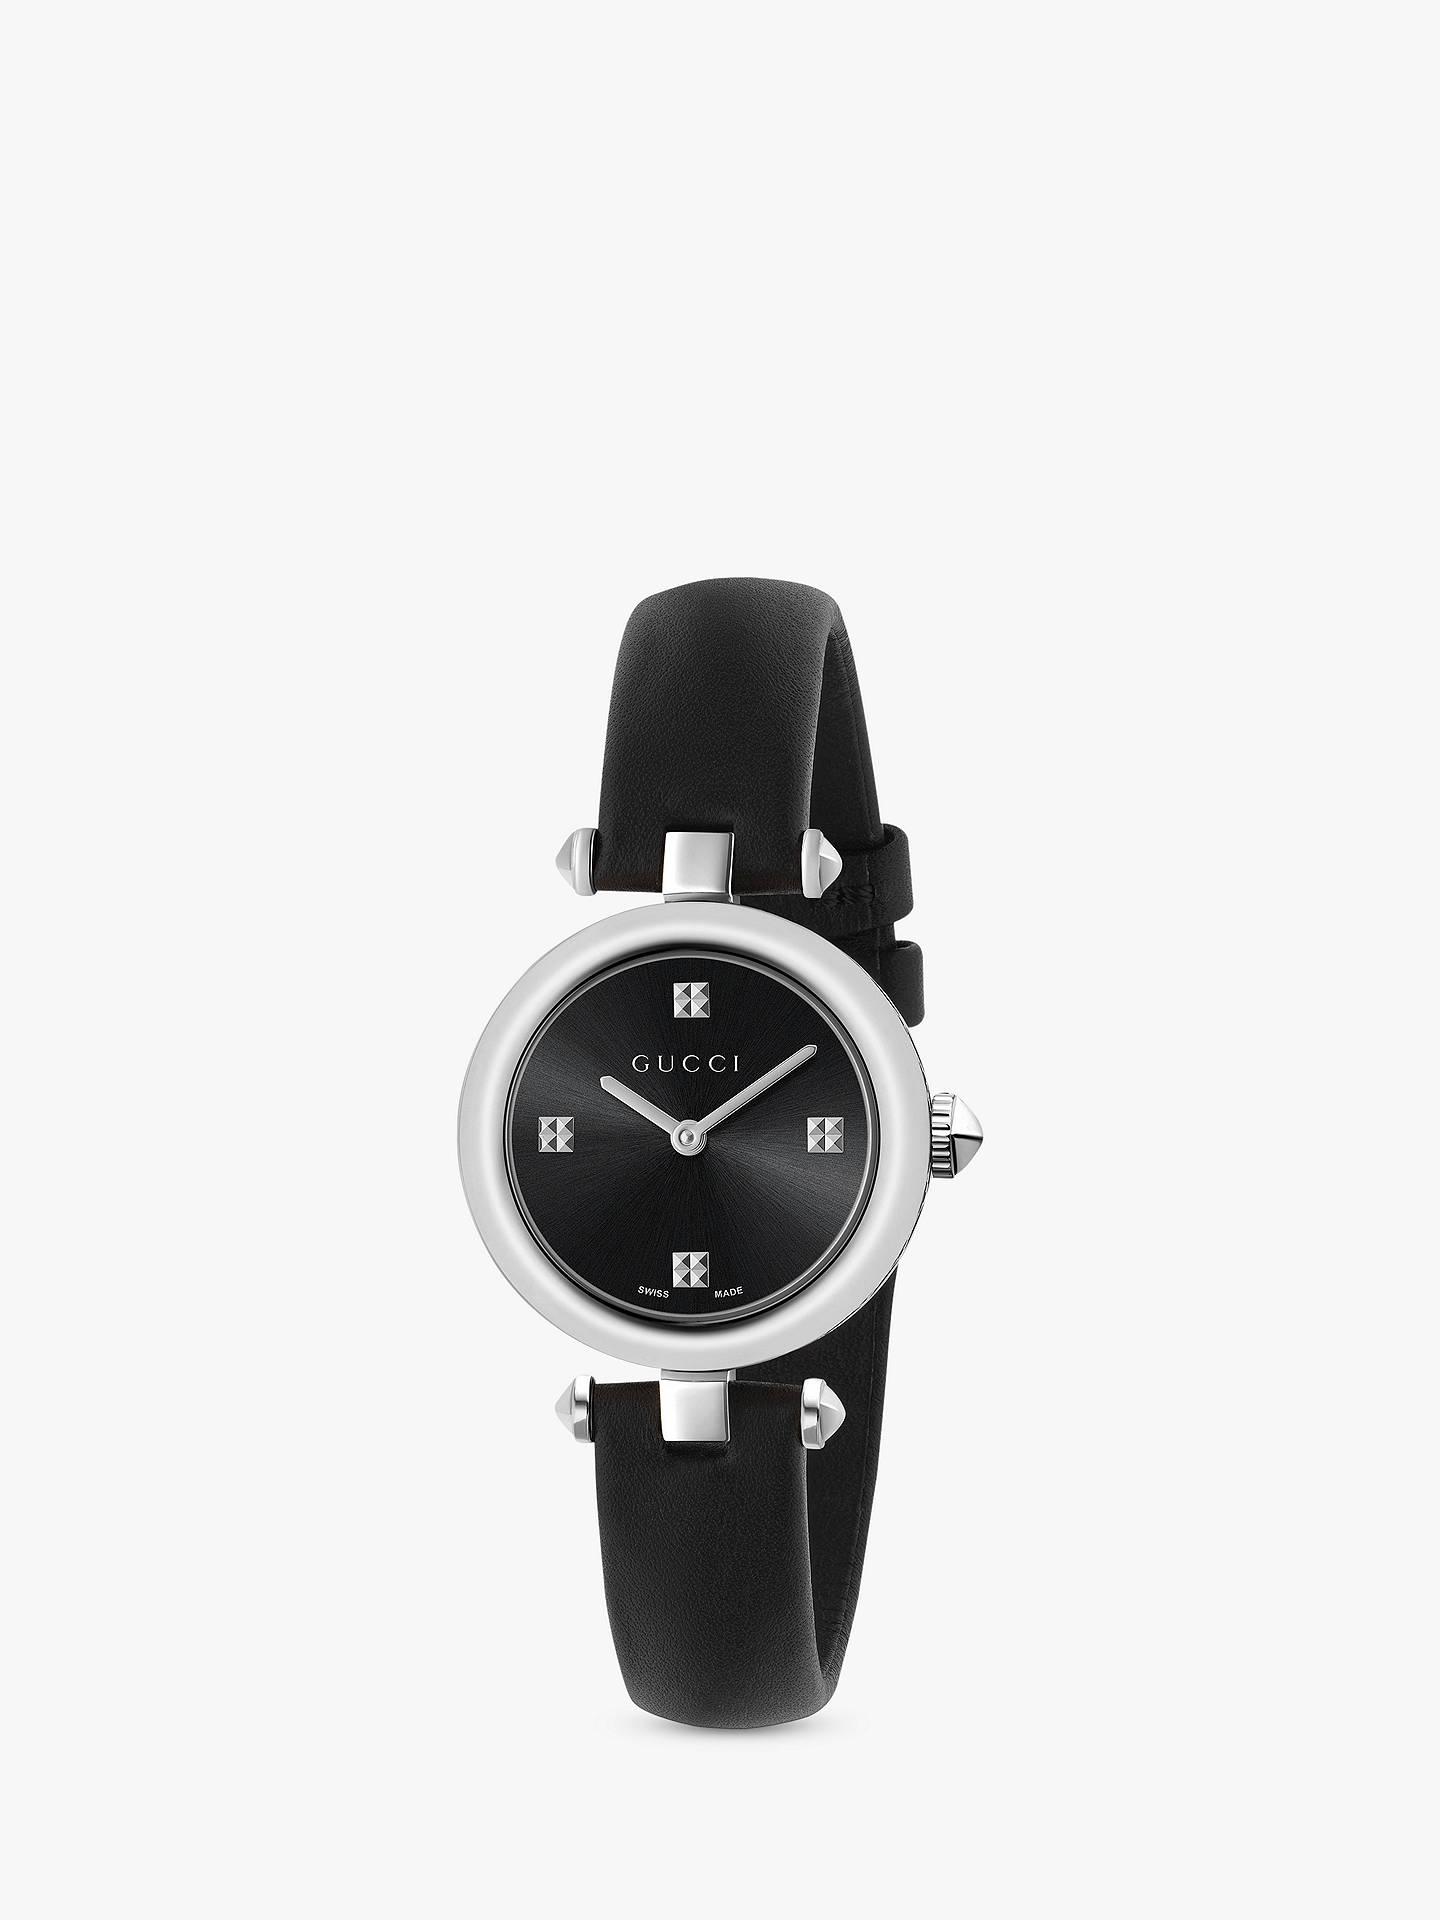 65858924fff Buy Gucci YA141506 Women s Diamantissima Leather Strap Watch